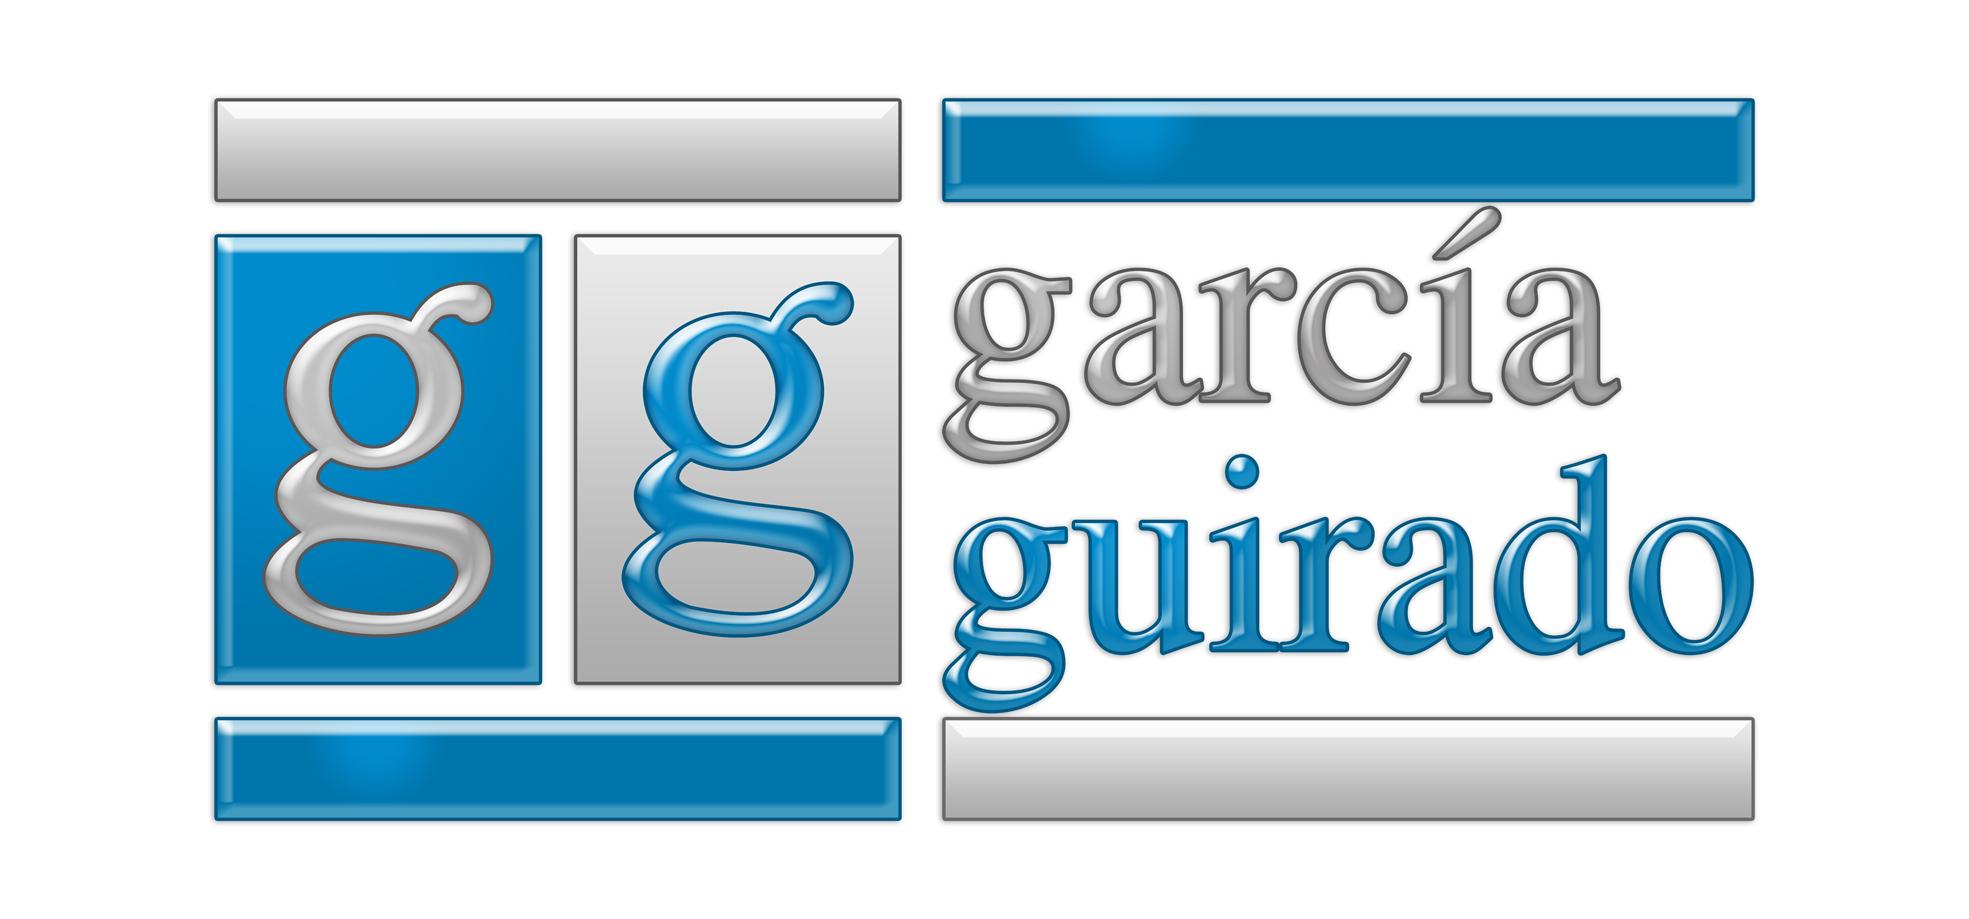 Joaquín Garcia Guirado